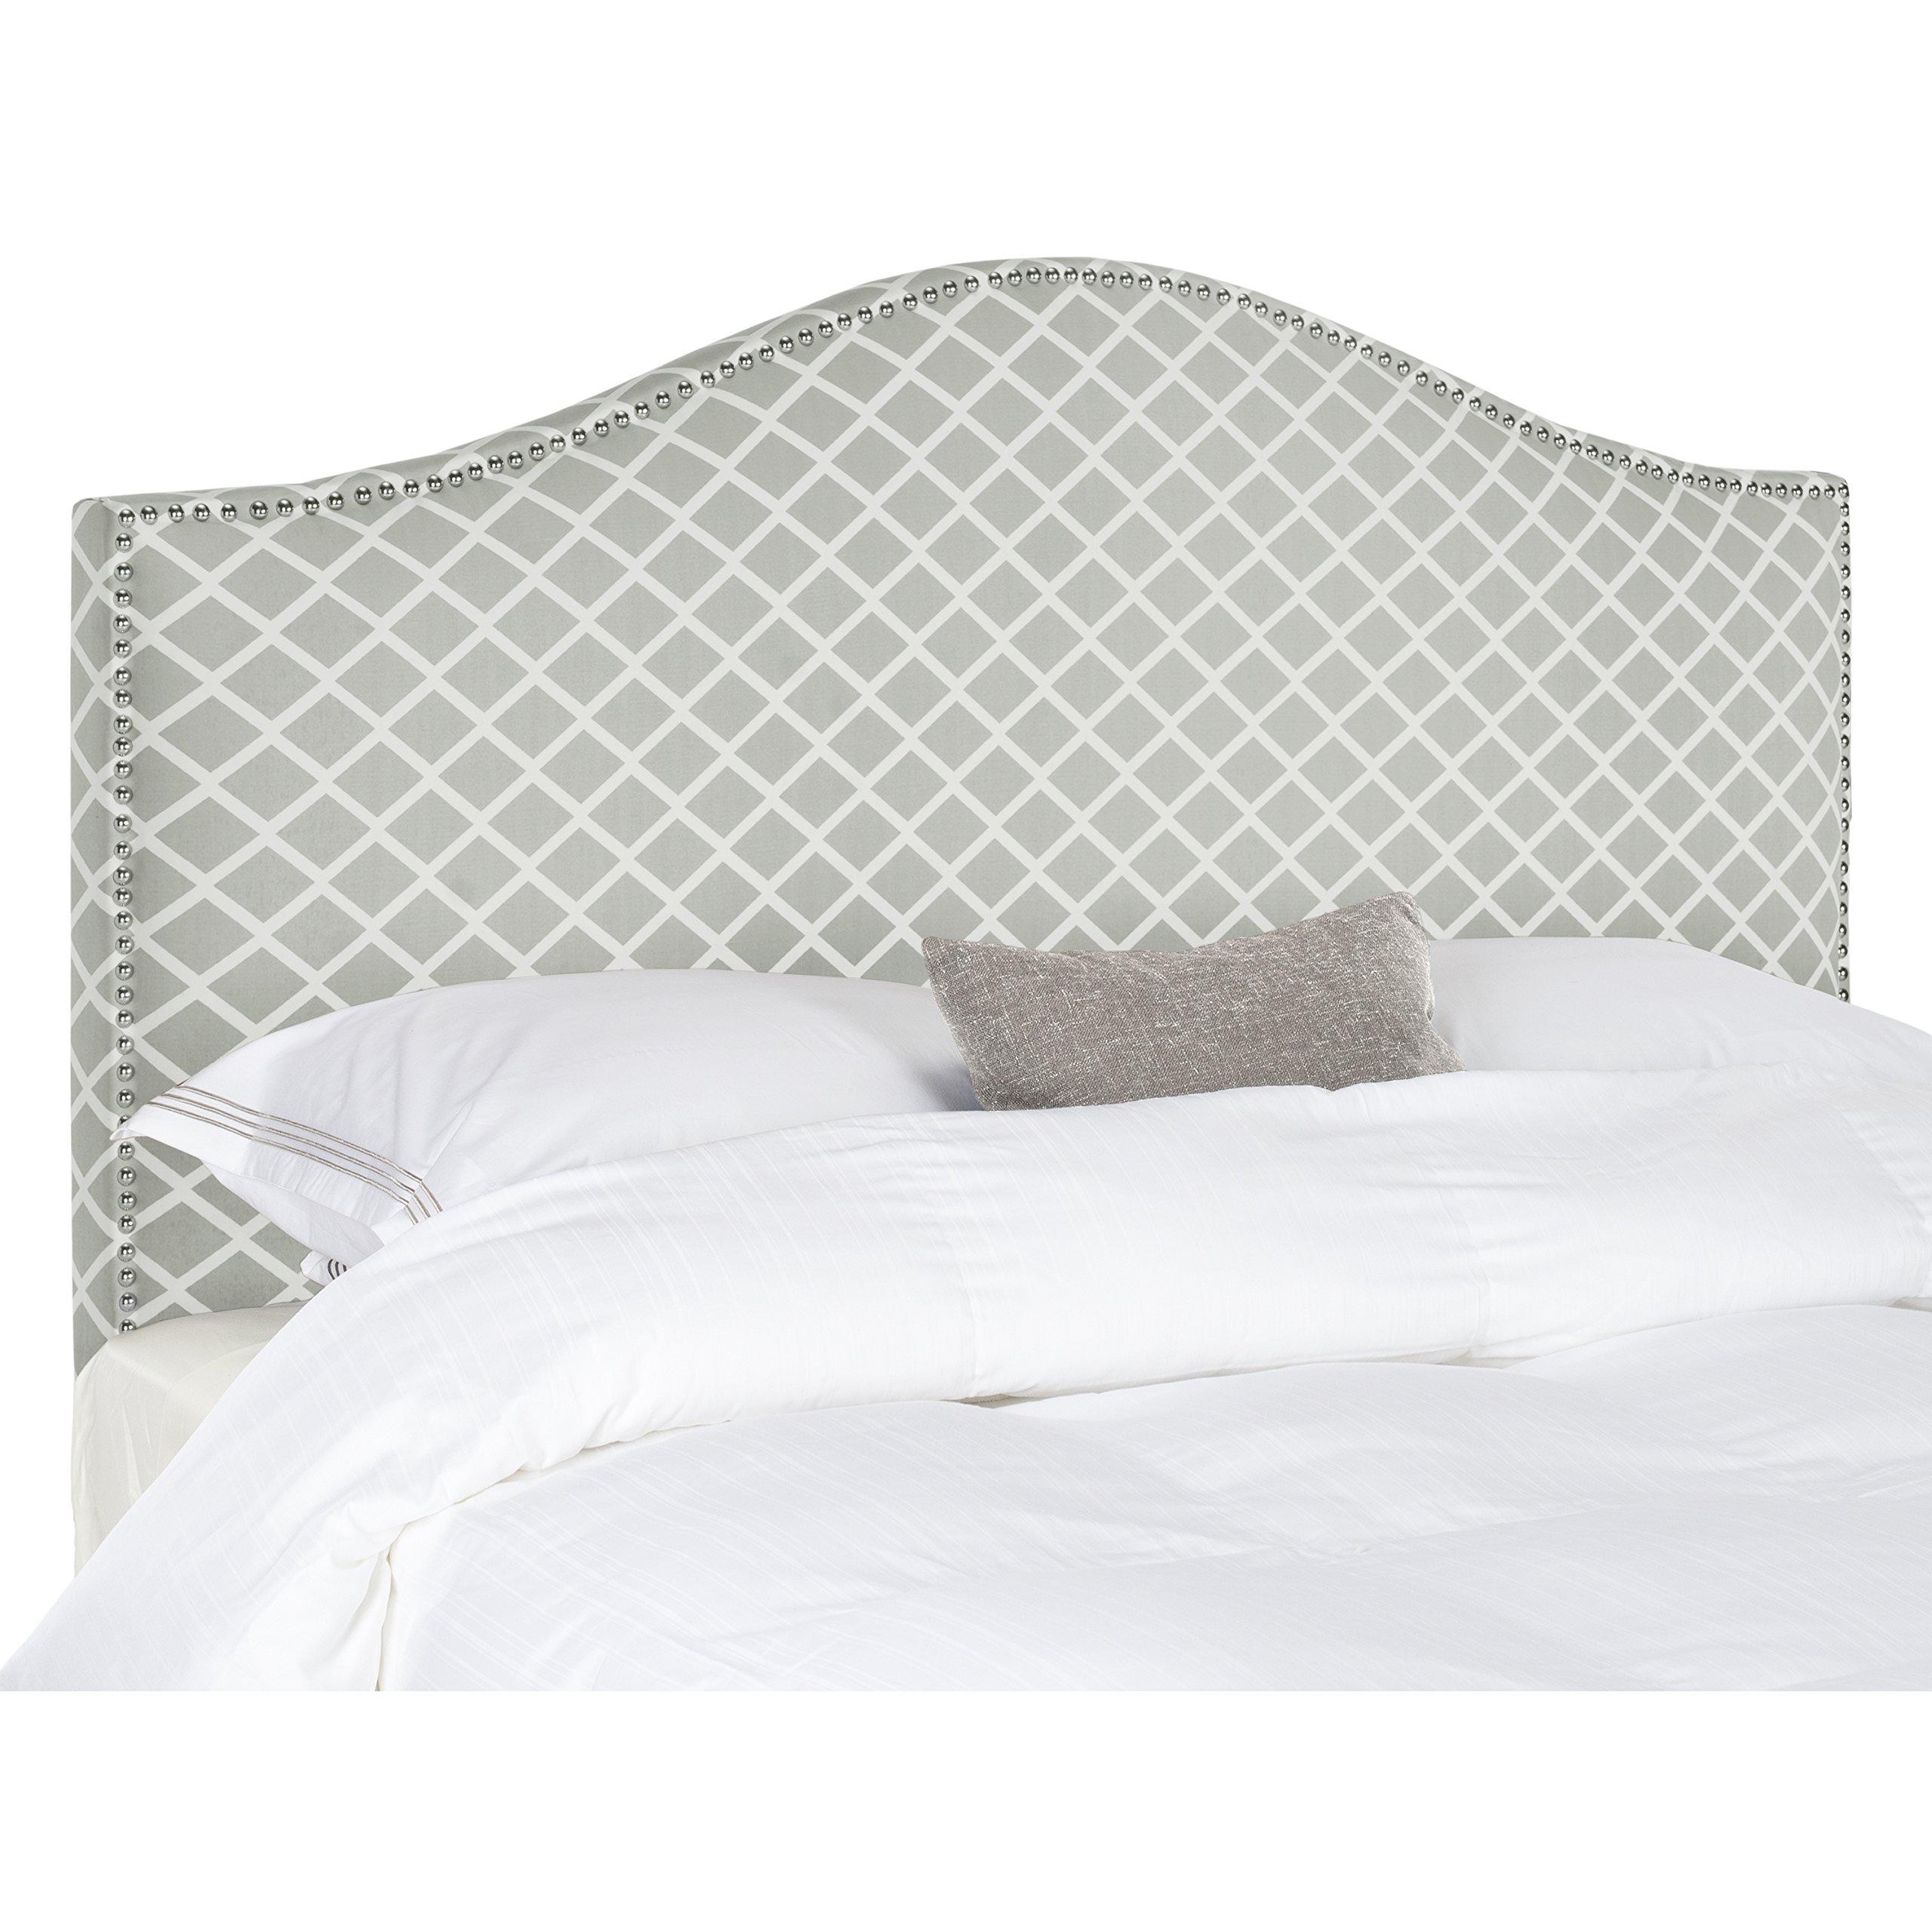 Safavieh Connie Grey/ White Camelback Upholstered Headboard - Silver Nailhead (King) by Safavieh